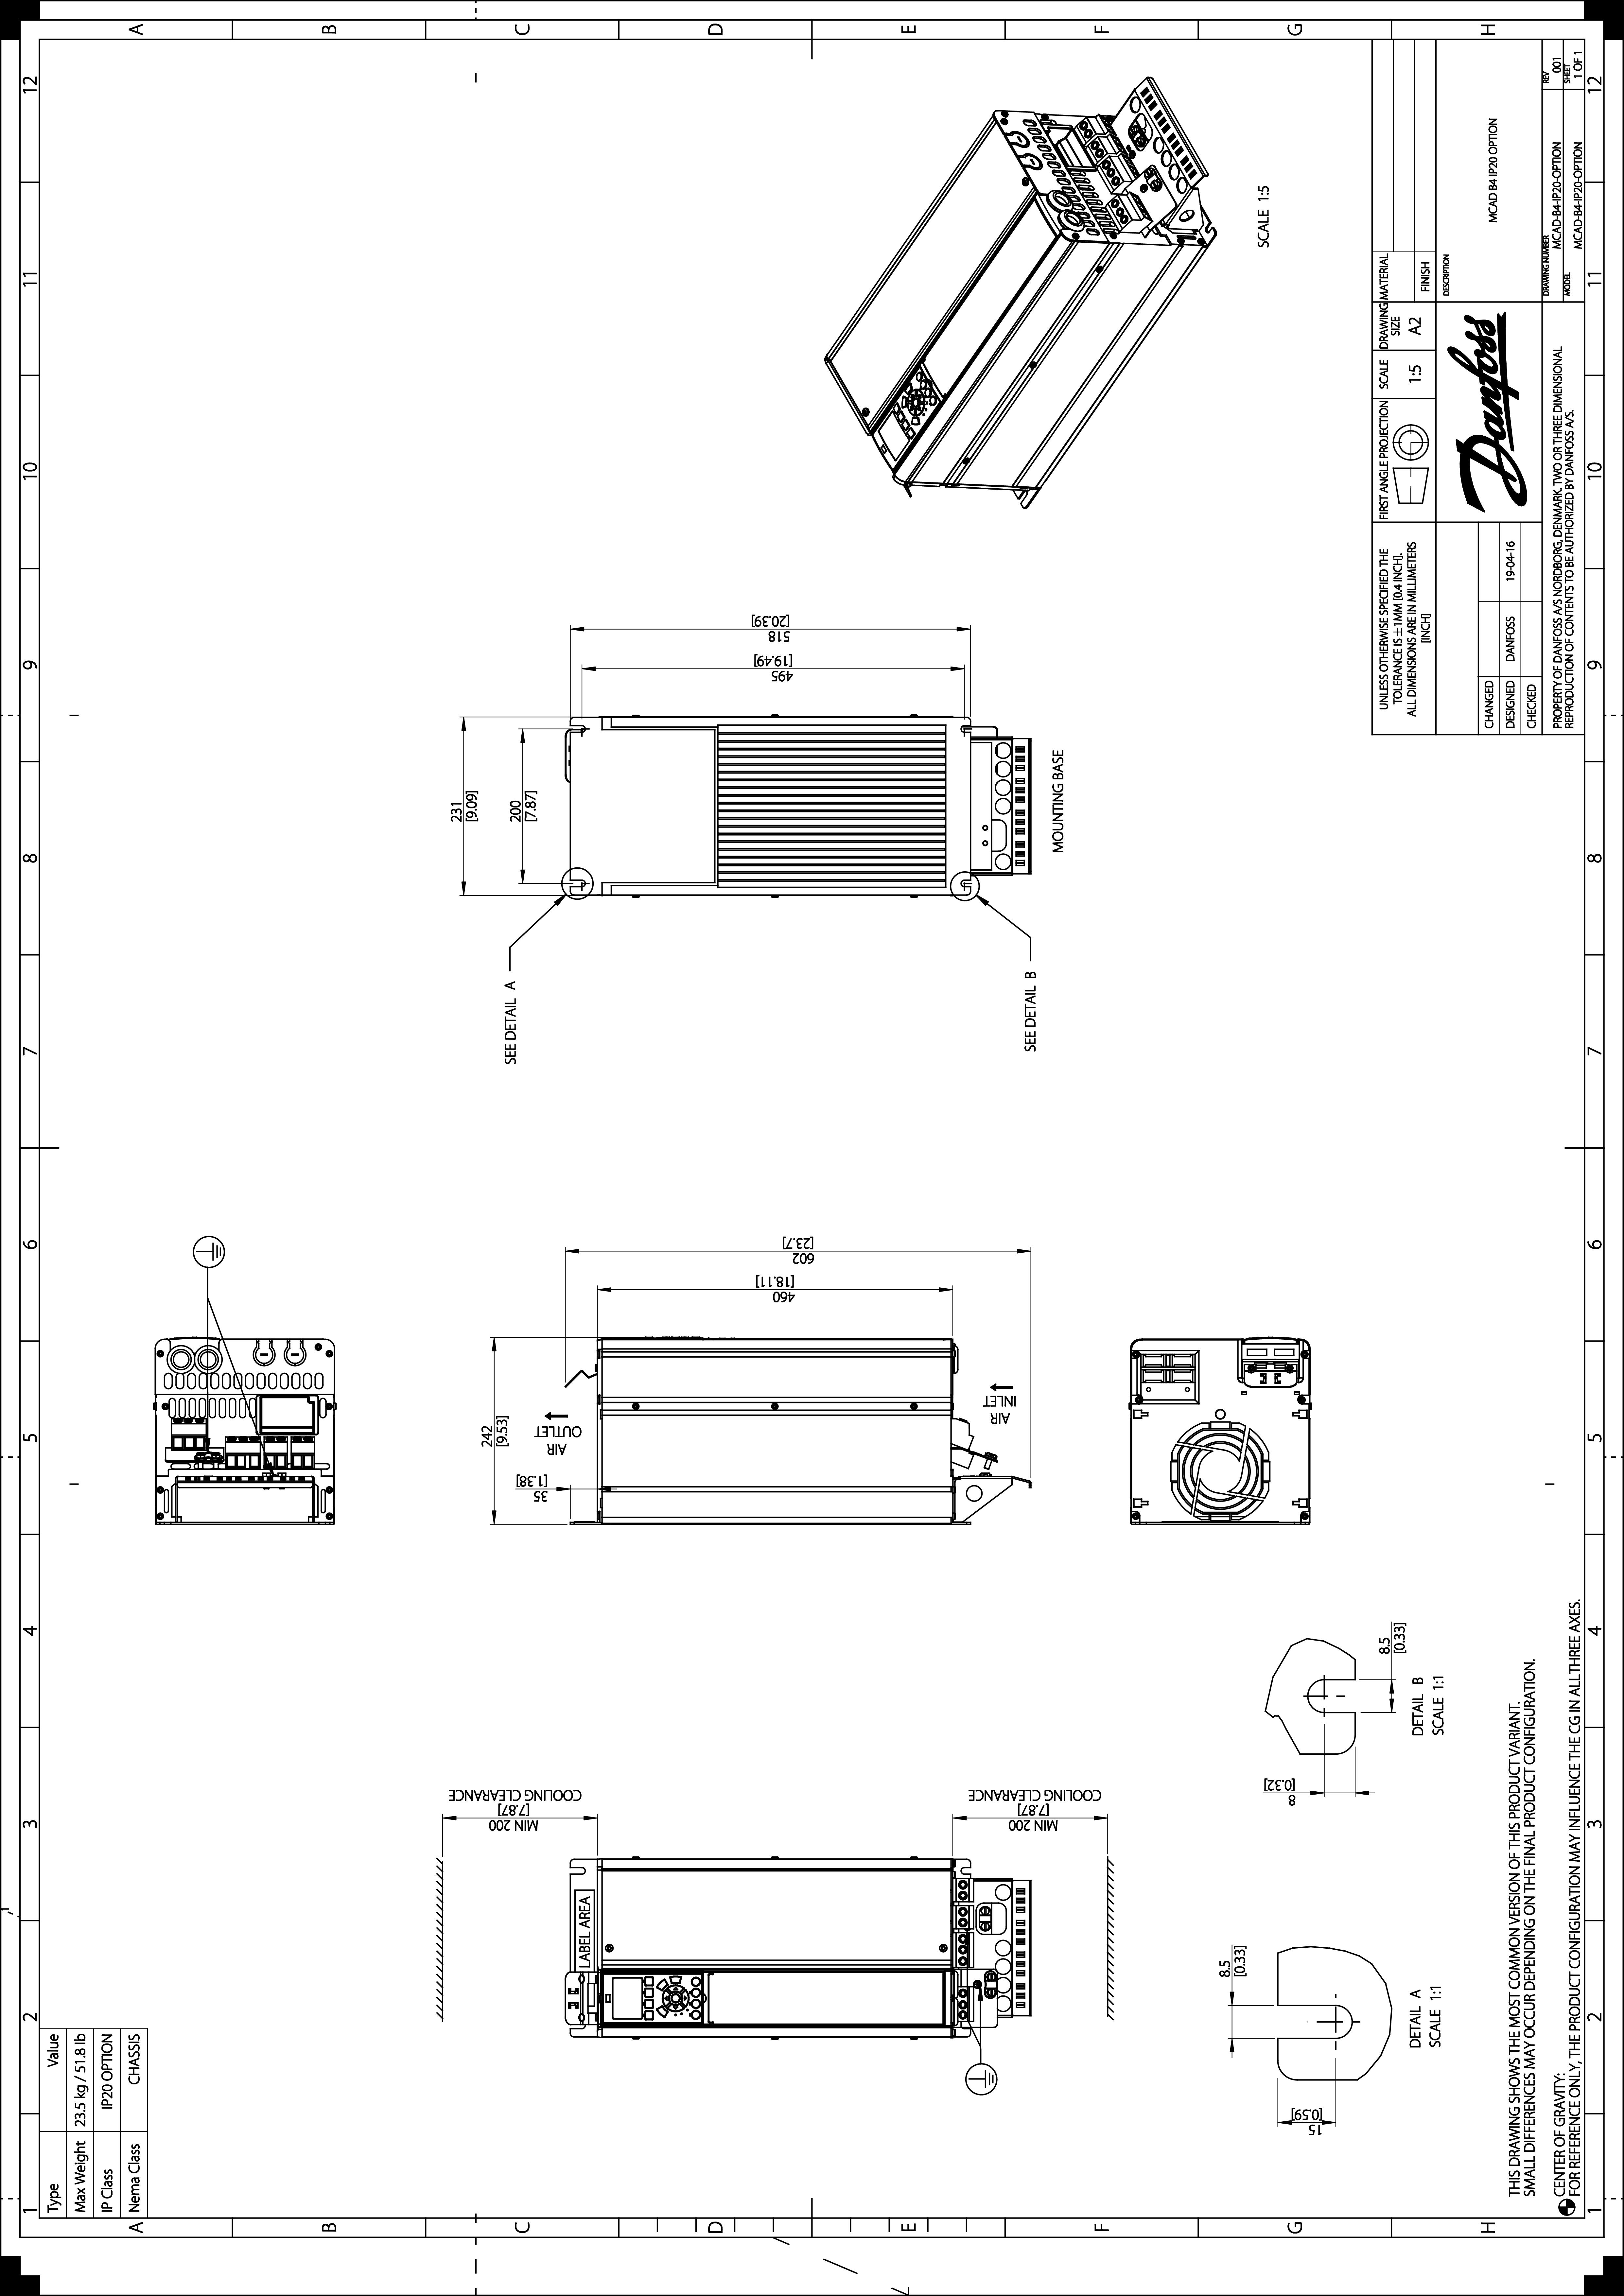 Vlt Aqua Drive Fc 202 Danfoss Septic Pump Control Box Wiring Diagram Free Picture 24 Mb